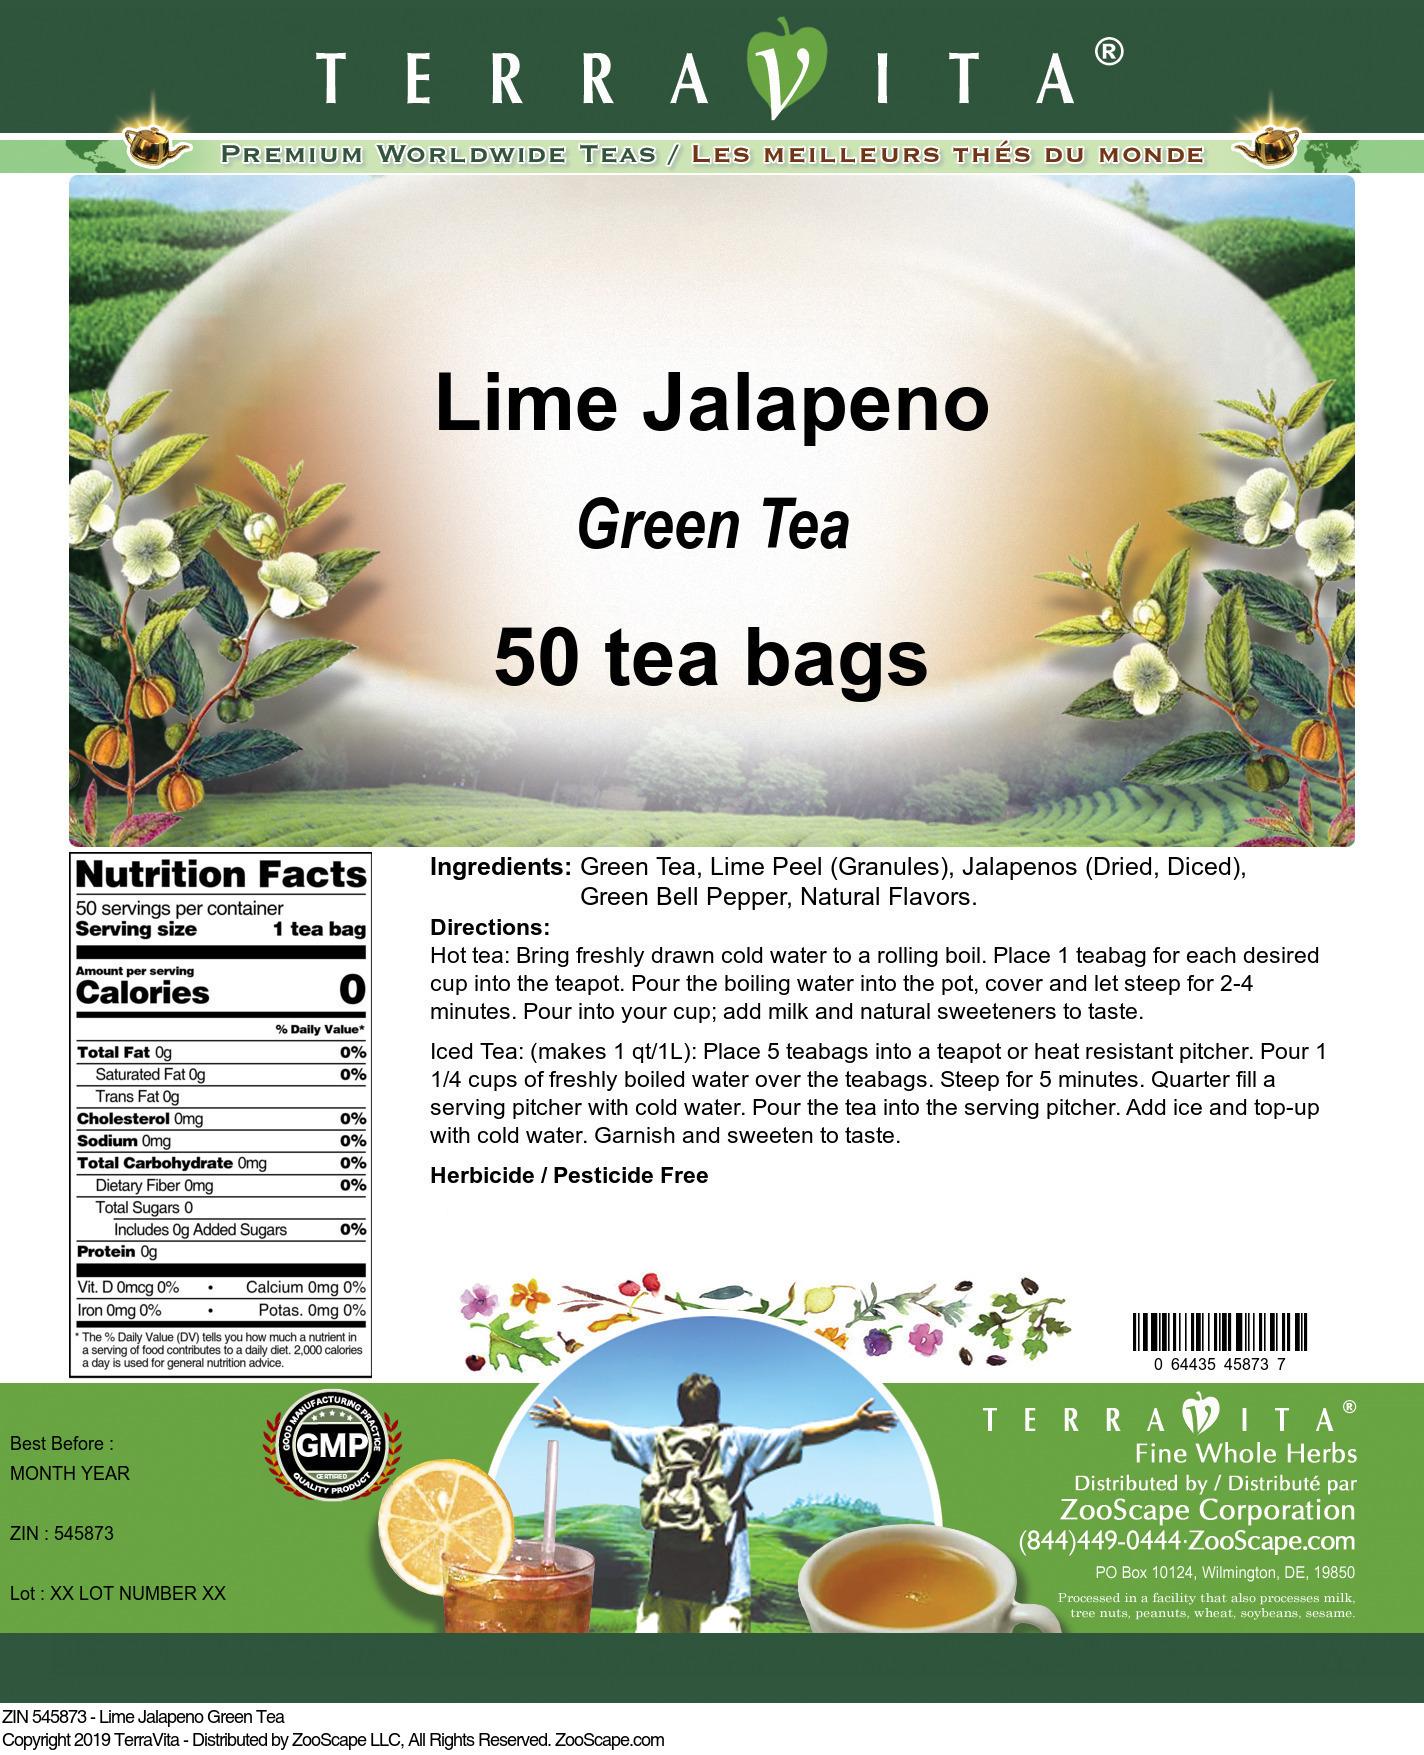 Lime Jalapeno Green Tea